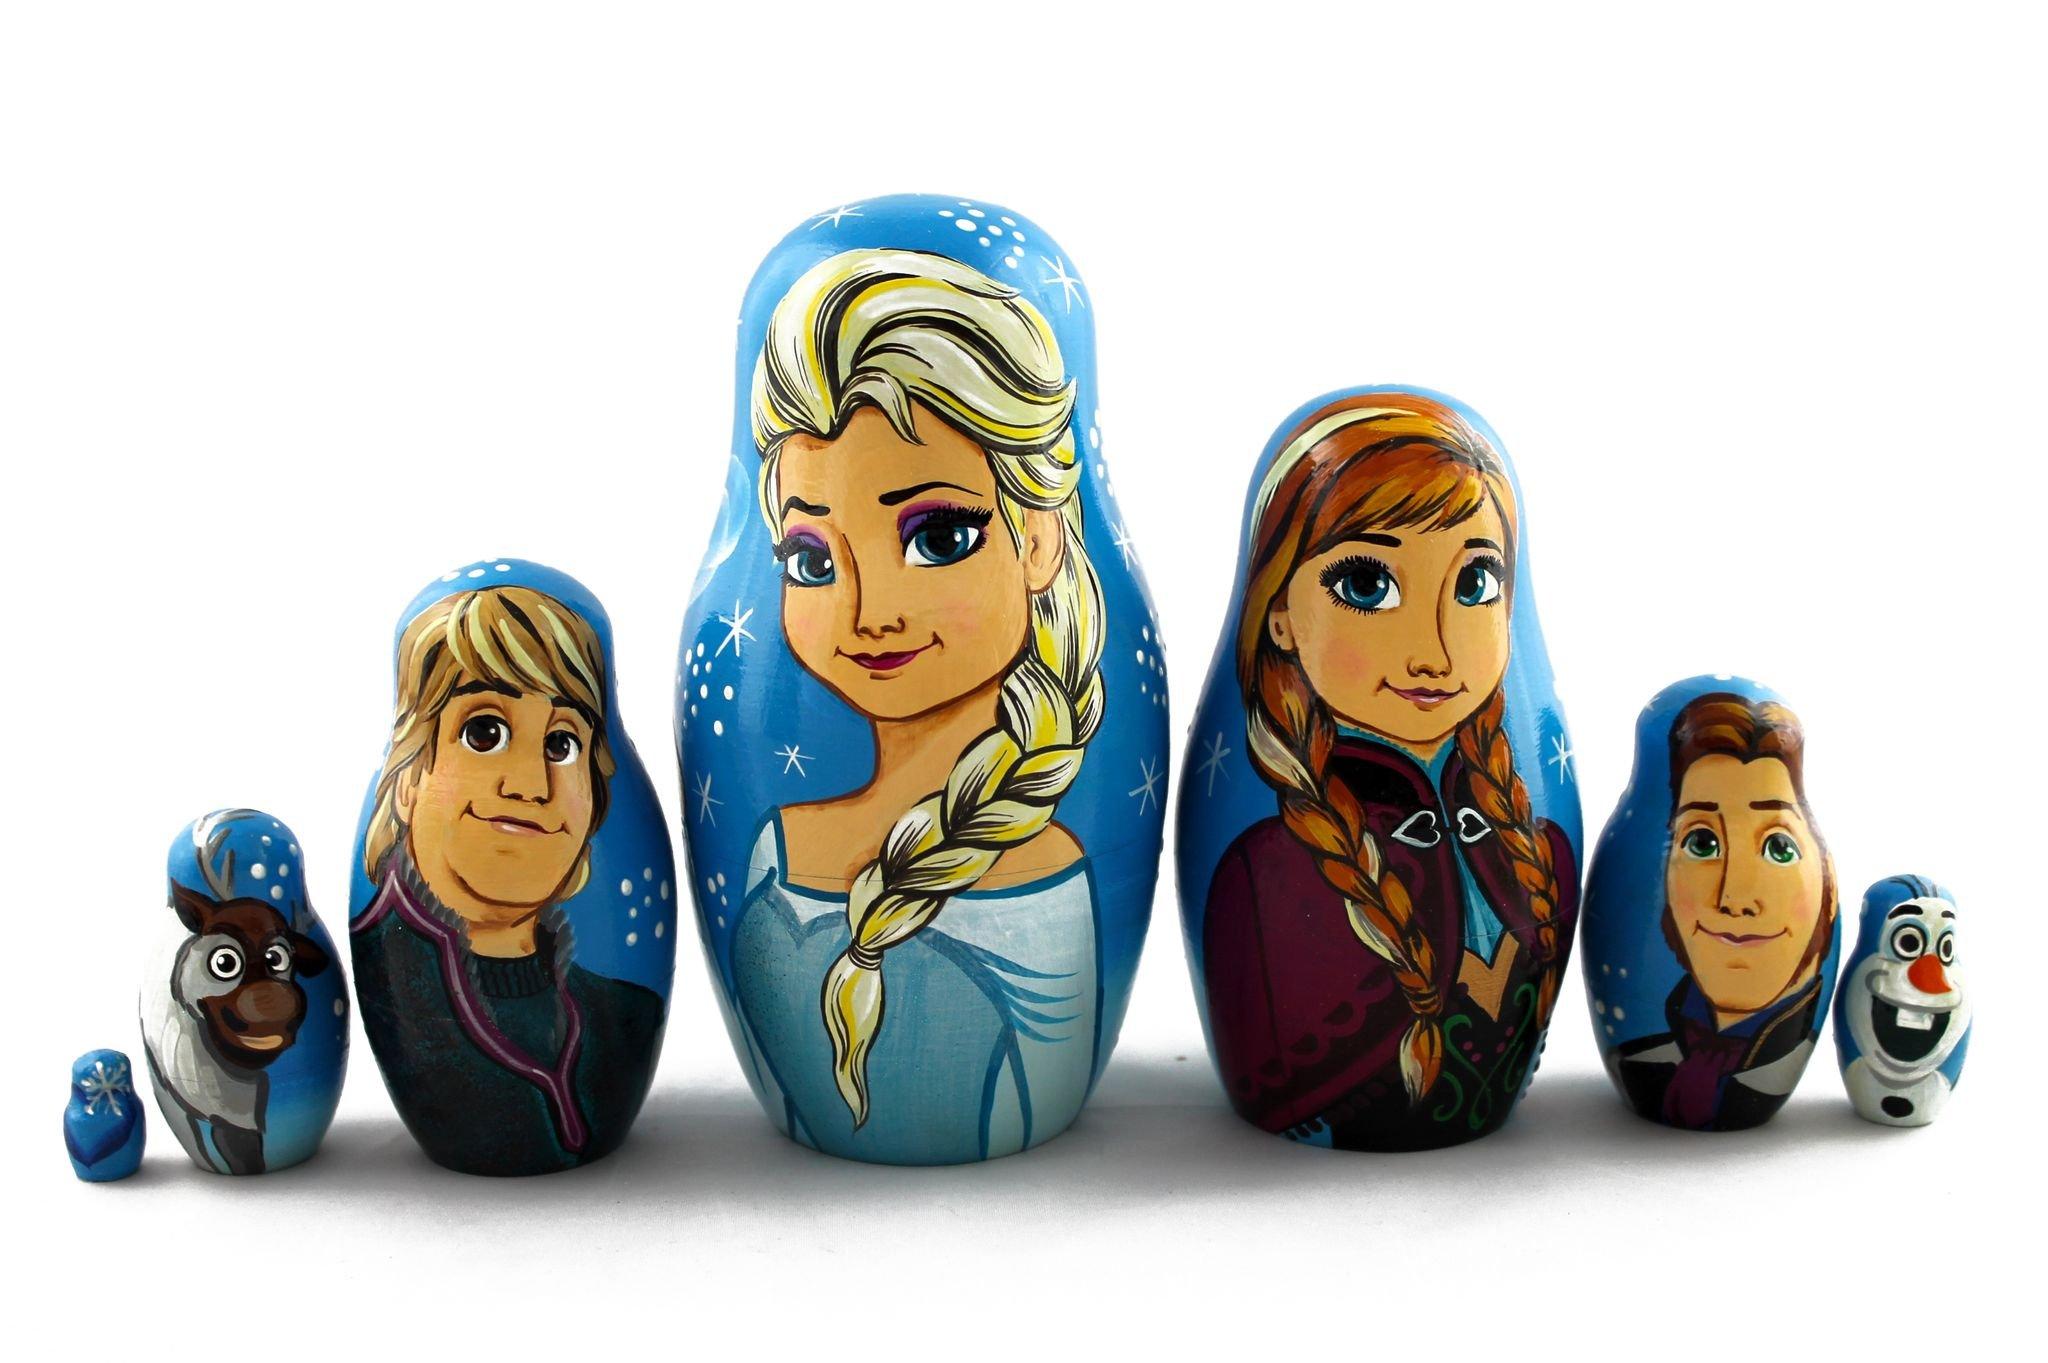 Matryoshka Russian Nesting Doll Babushka Beautiful Cartoon Characters Frozen Elsa Elza 7 Pieces Pcs Wooden Hand Painted Souvenir Craft Gift by MATRYOSHKA&HANDICRAFT by MATRYOSHKA&HANDICRAFT (Image #6)